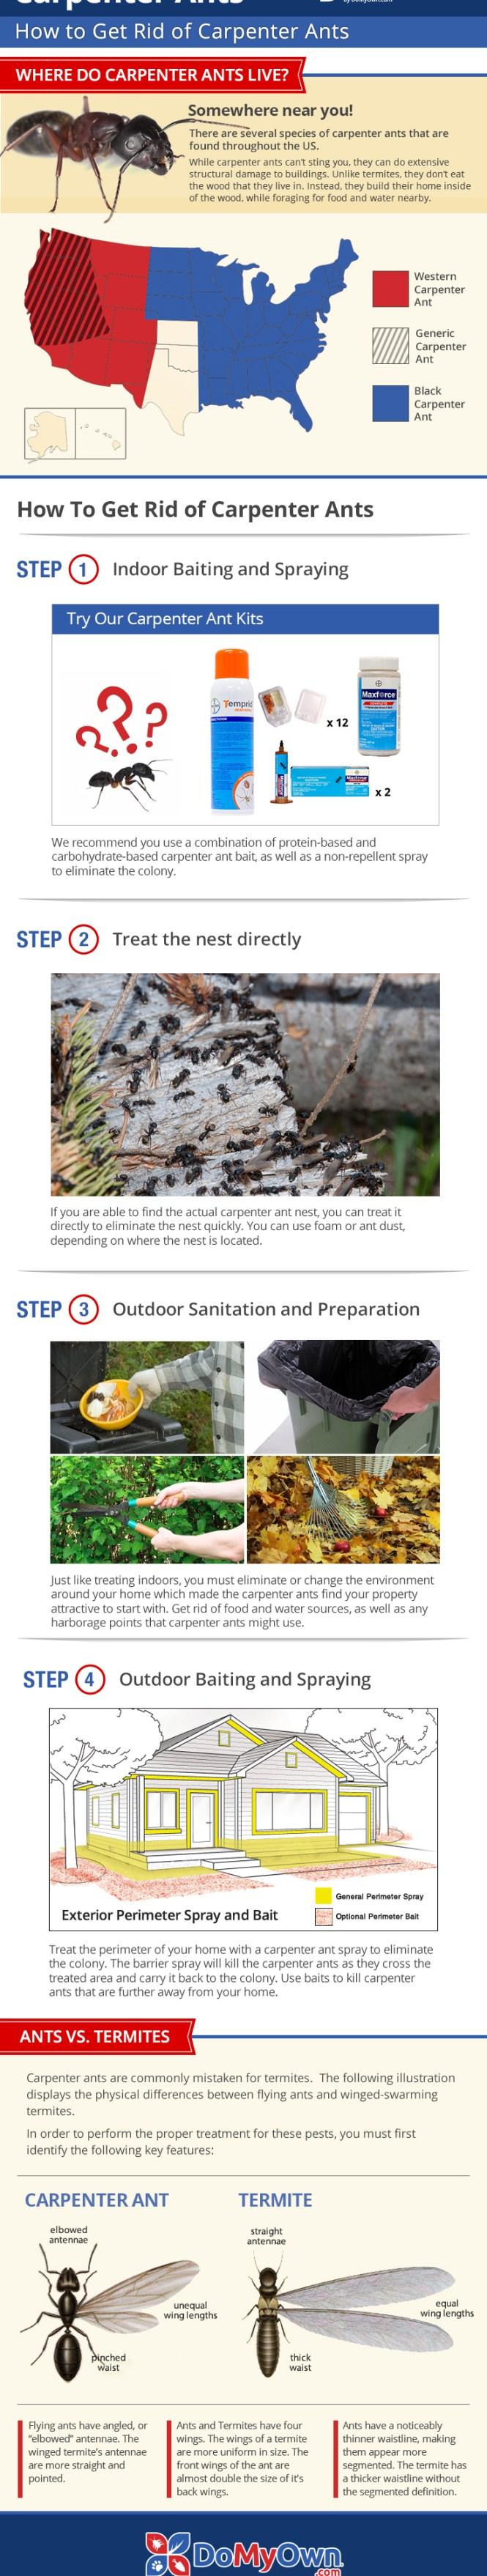 Carpenter Ant Treatment Infographic